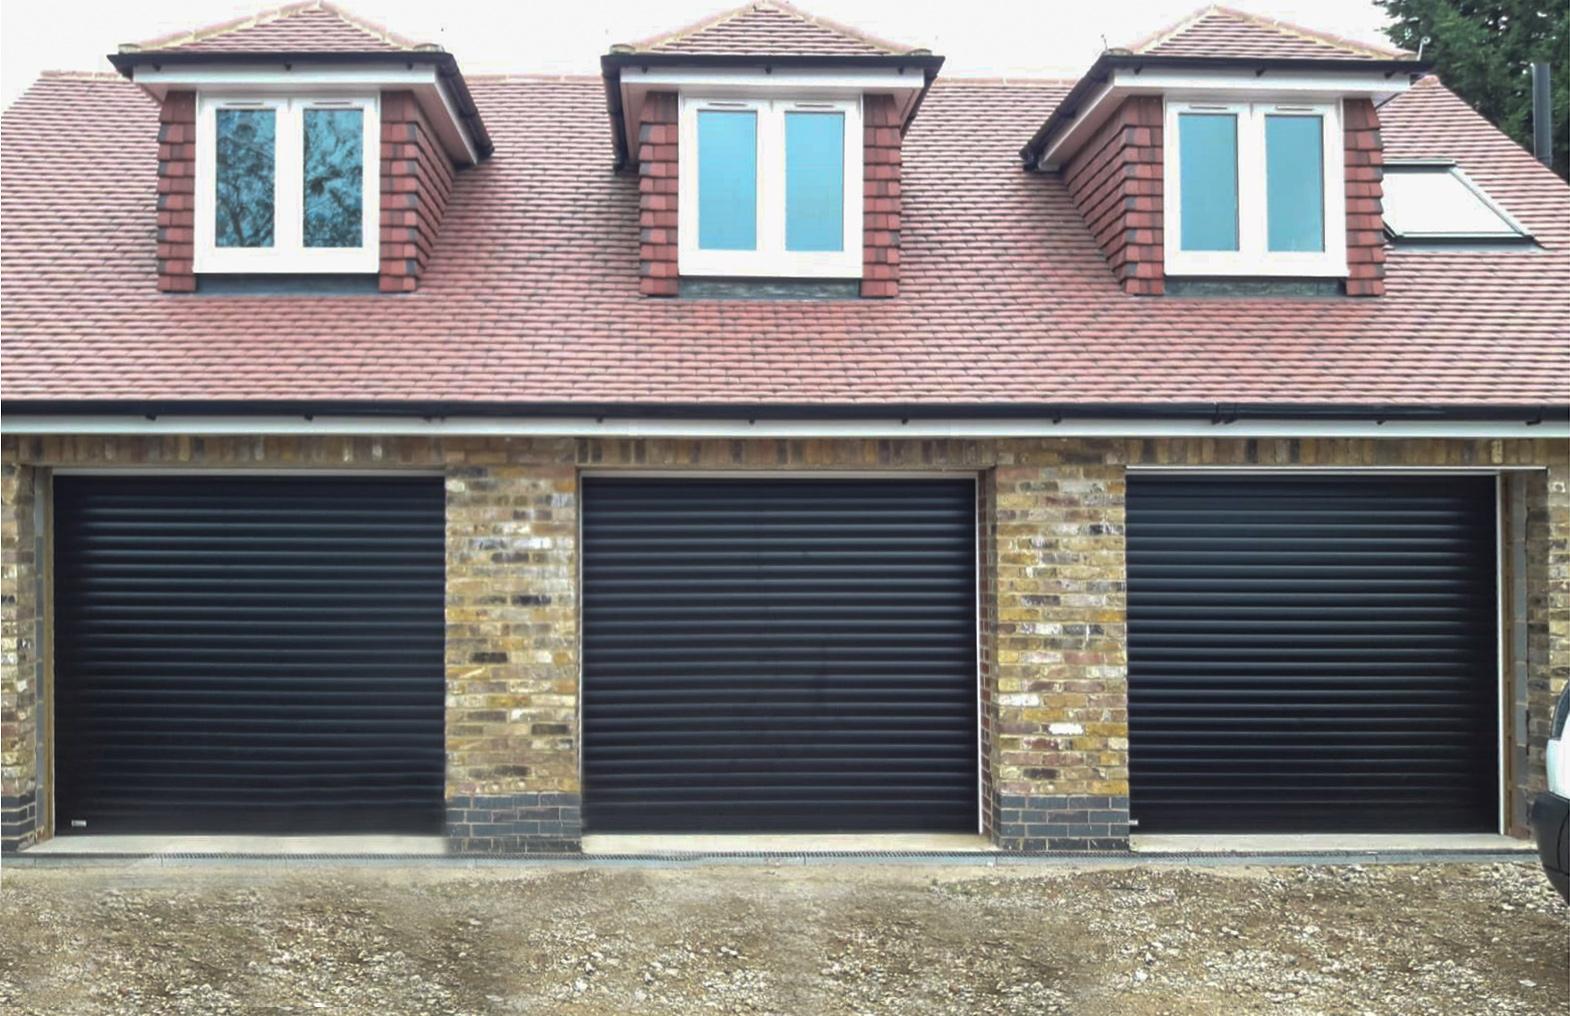 3x SWS SeceuroGlide Original Insulated Roller Garage Doors Finished in Black